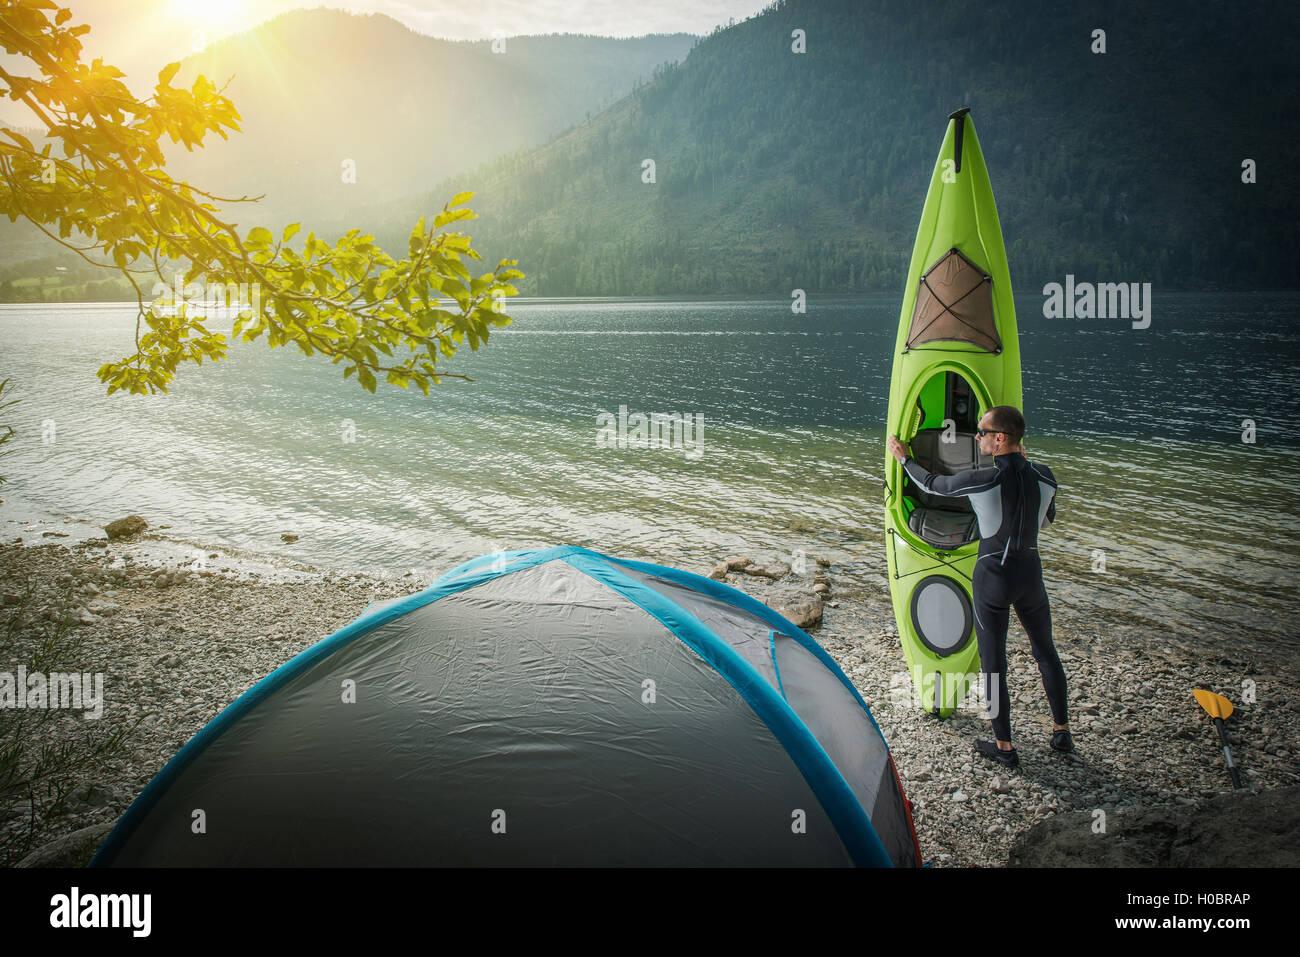 Kayak Tour Preparation. Caucasian Men with His Kayak and Lake Shore Located Tent Preparing For Kayak Tour. Kayaking - Stock Image